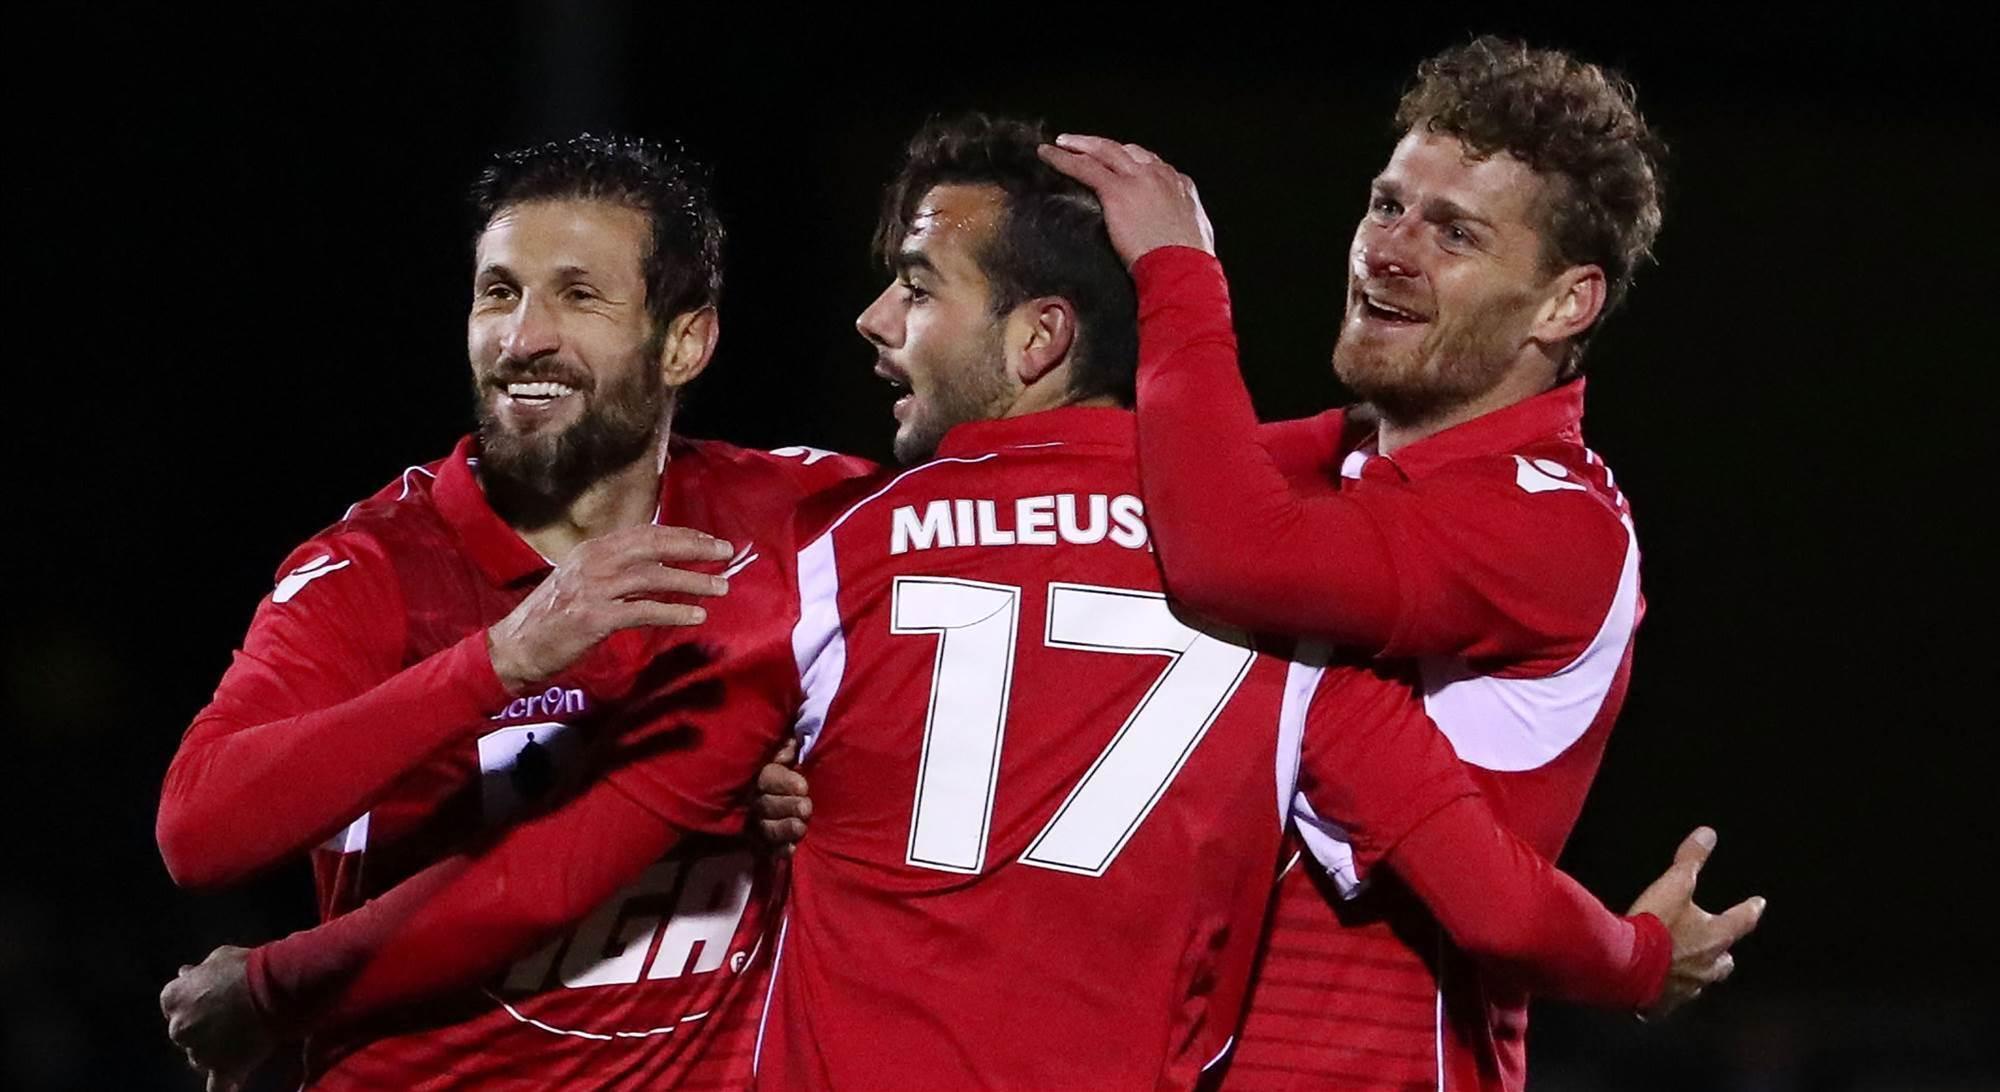 Mileusnic treble sends Reds into semis